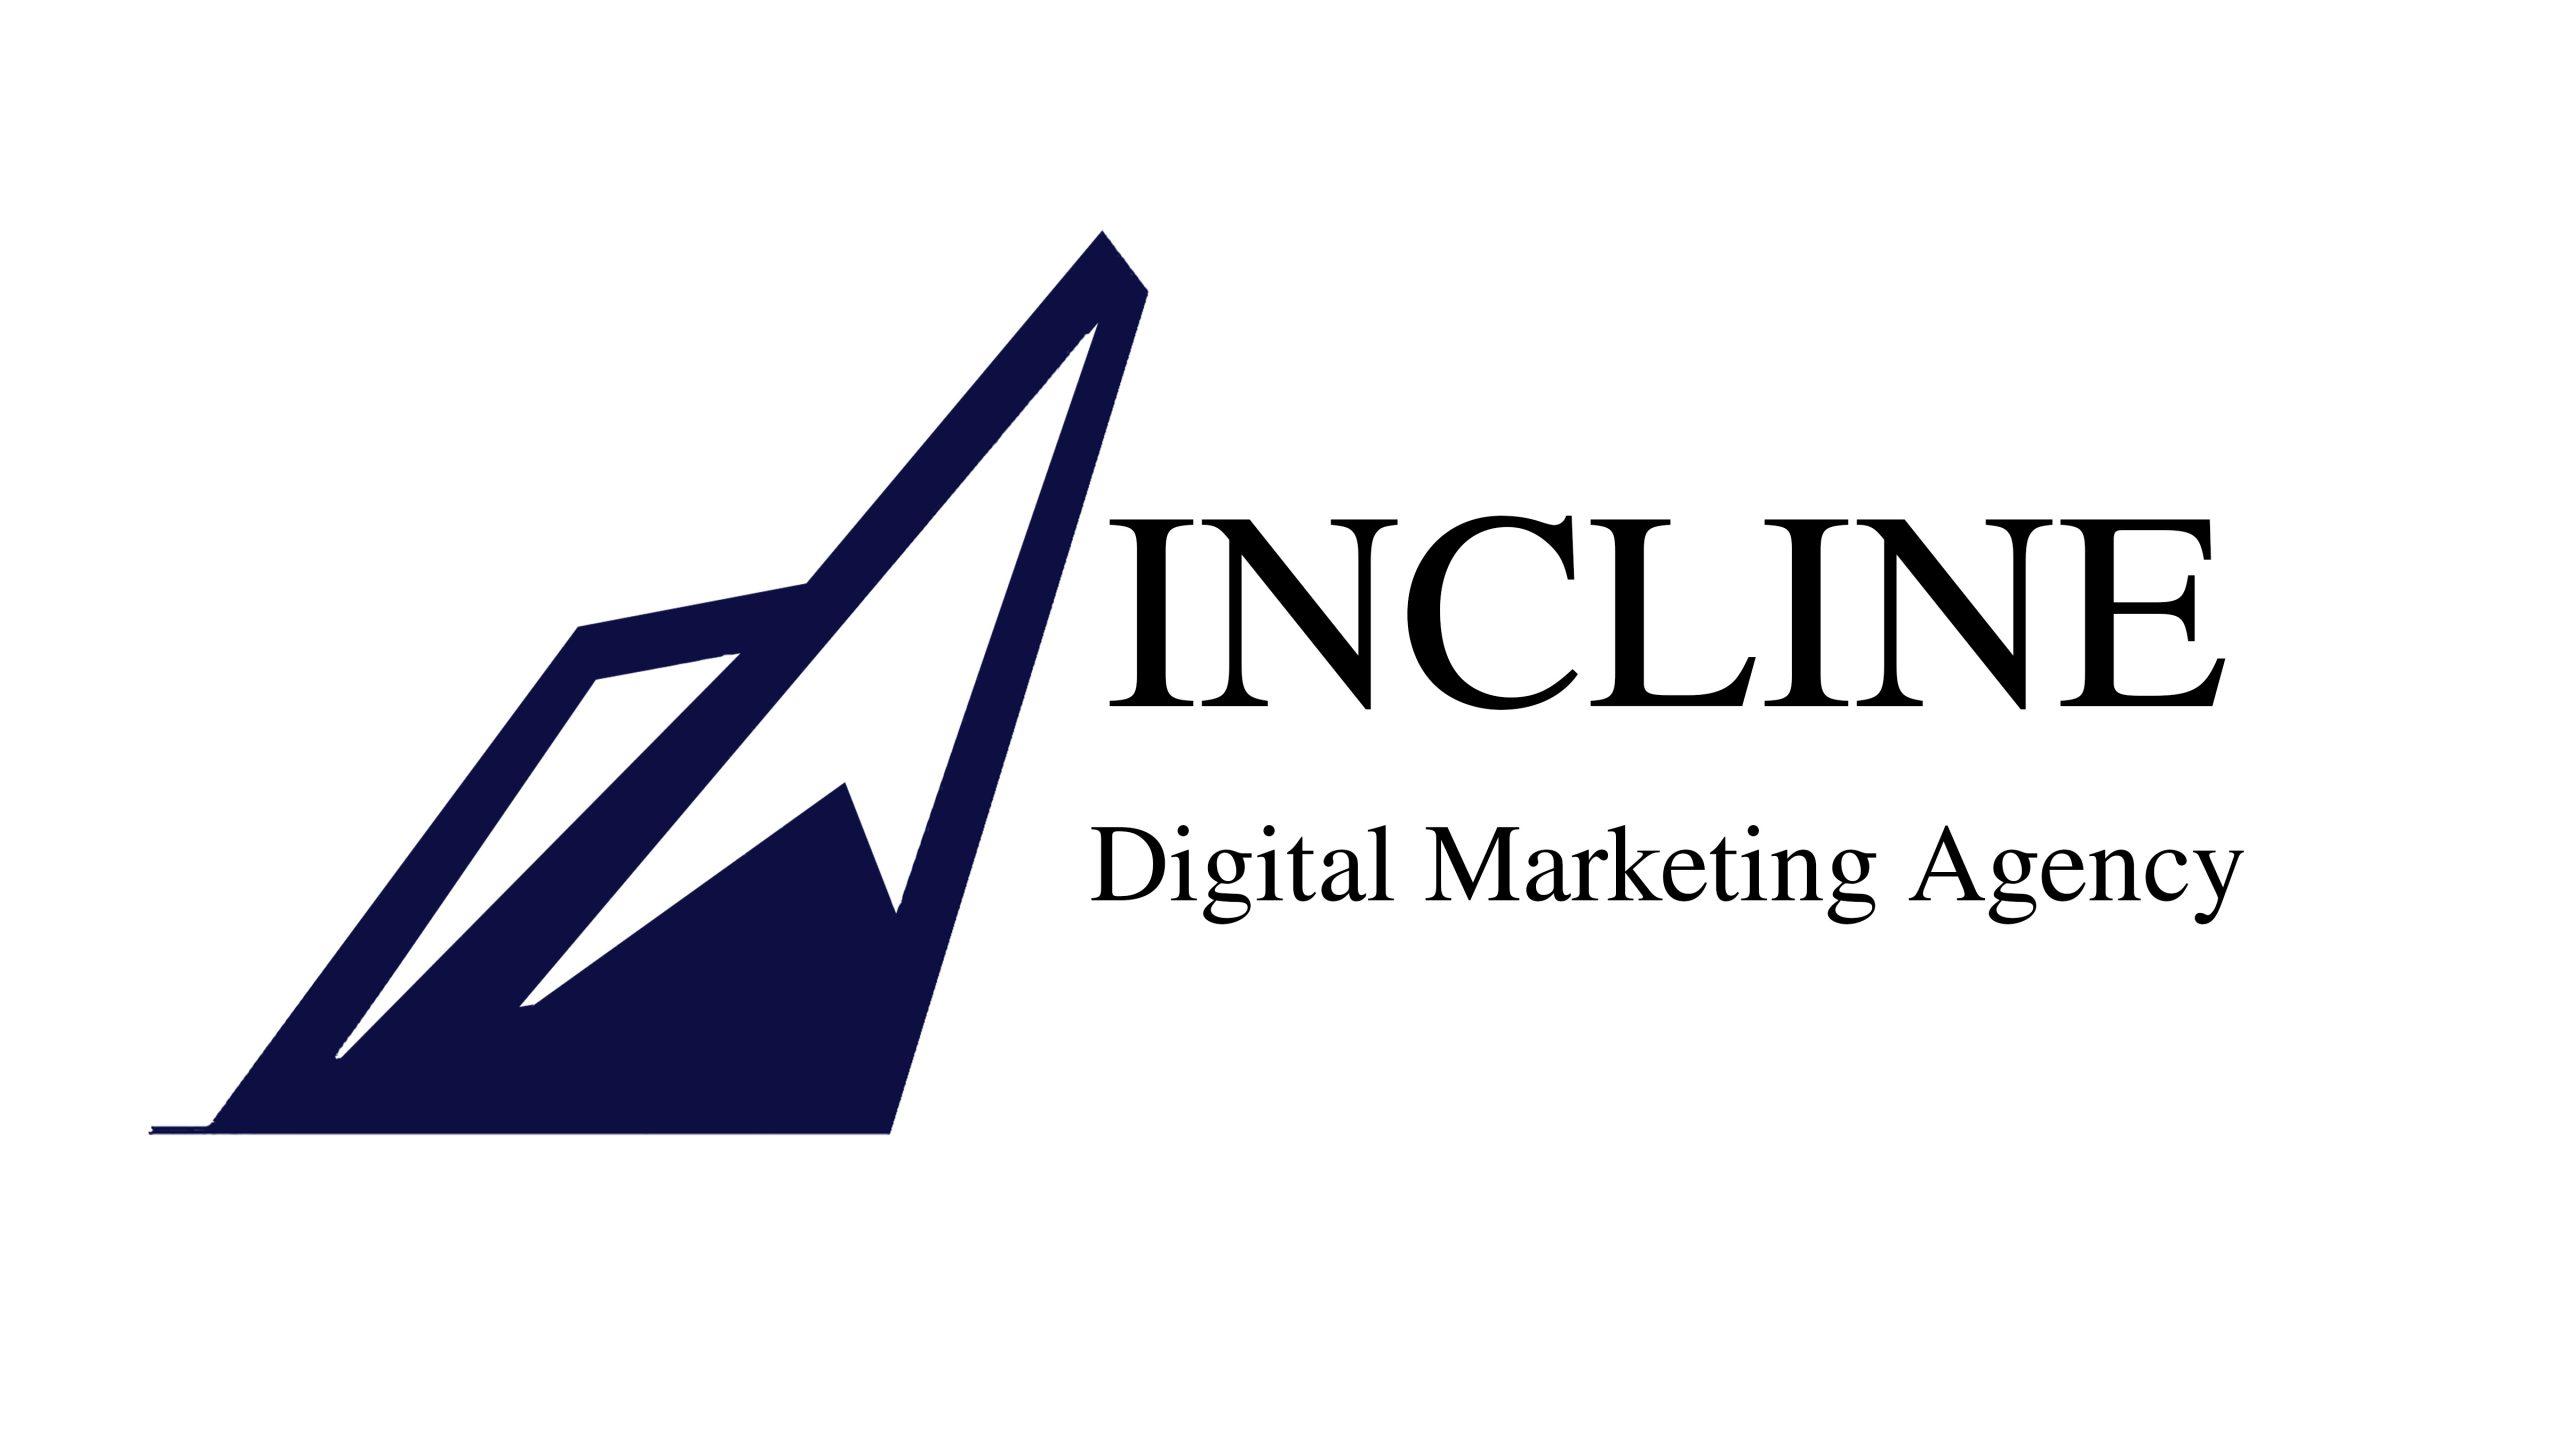 Incline DMA